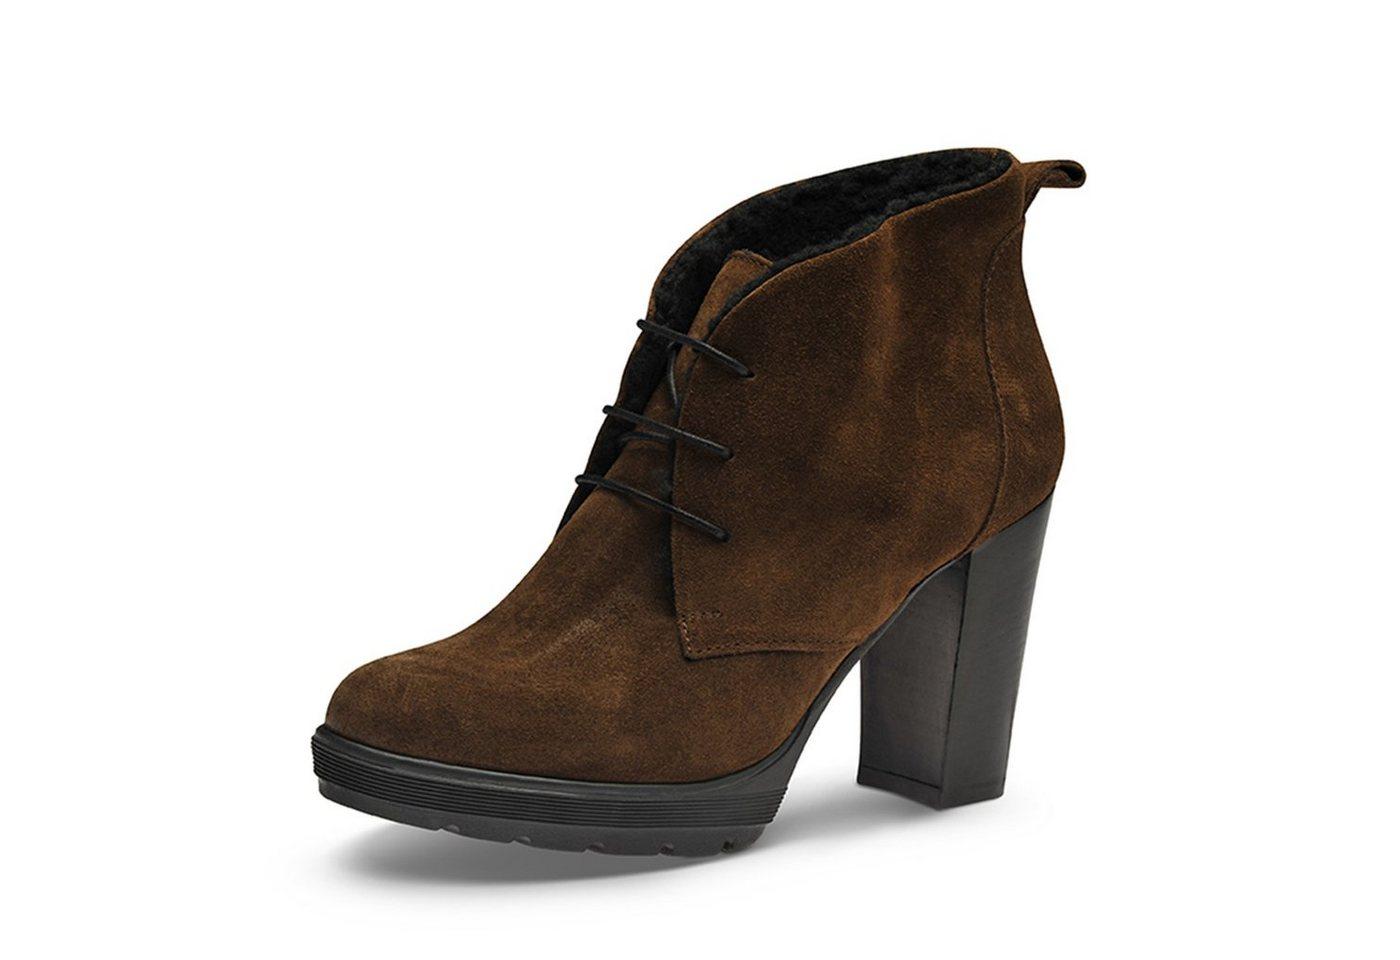 Evita »TUANA« Plateaustiefelette | Schuhe > Stiefeletten > Plateaustiefeletten | Braun | Evita